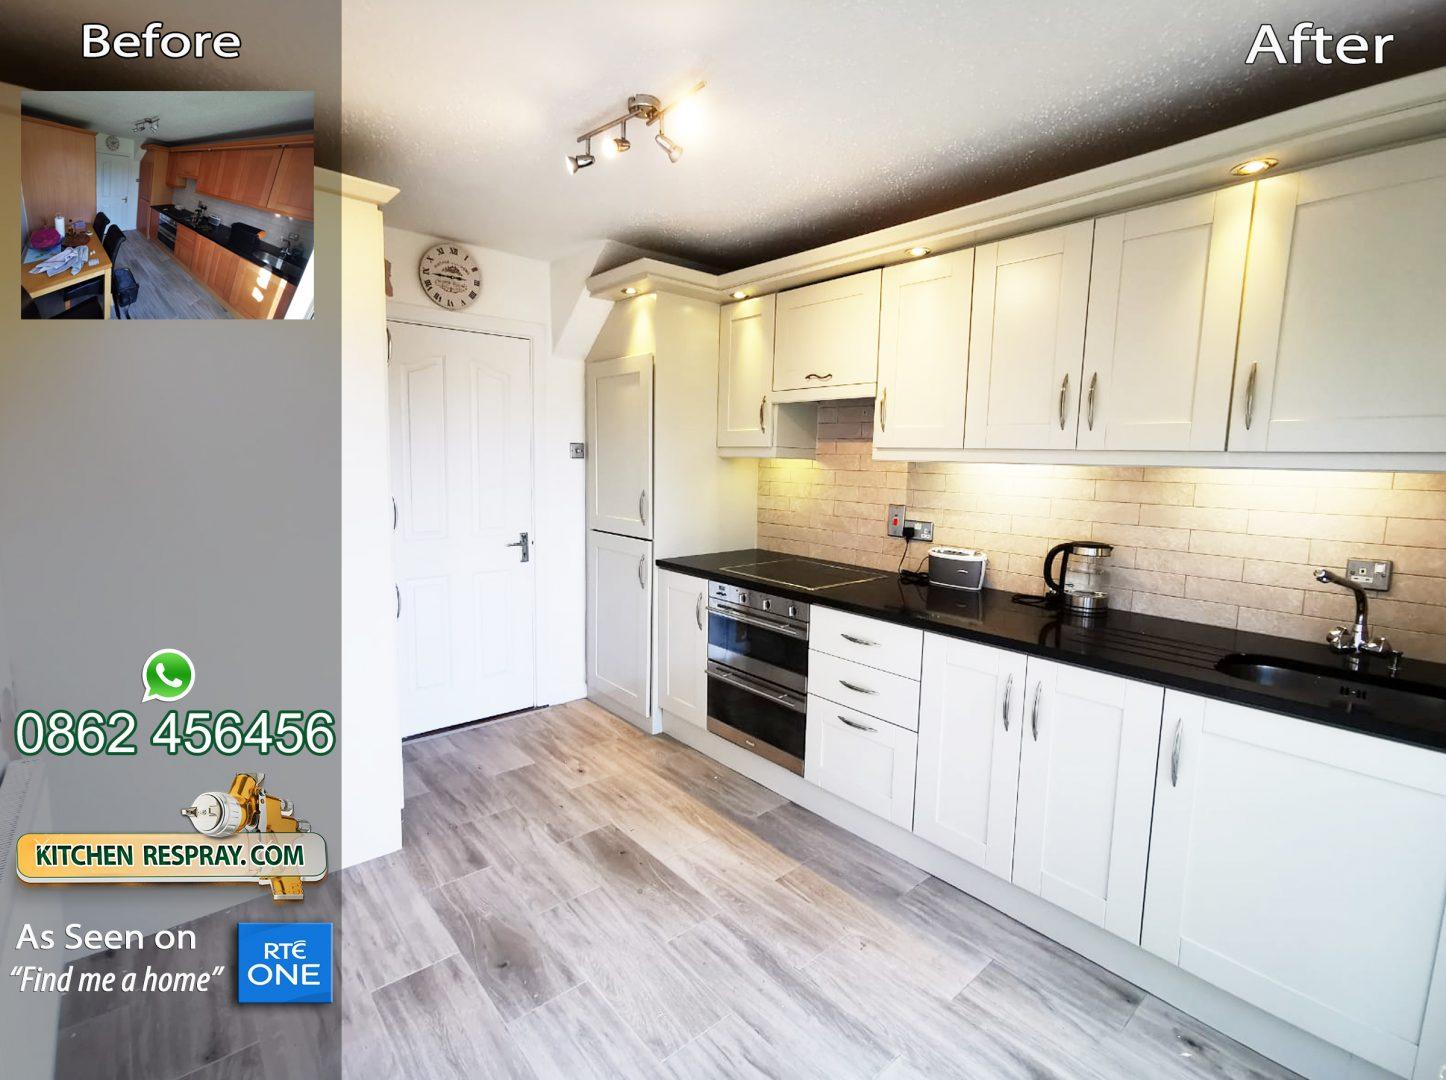 Kitchen Respray Shaded white